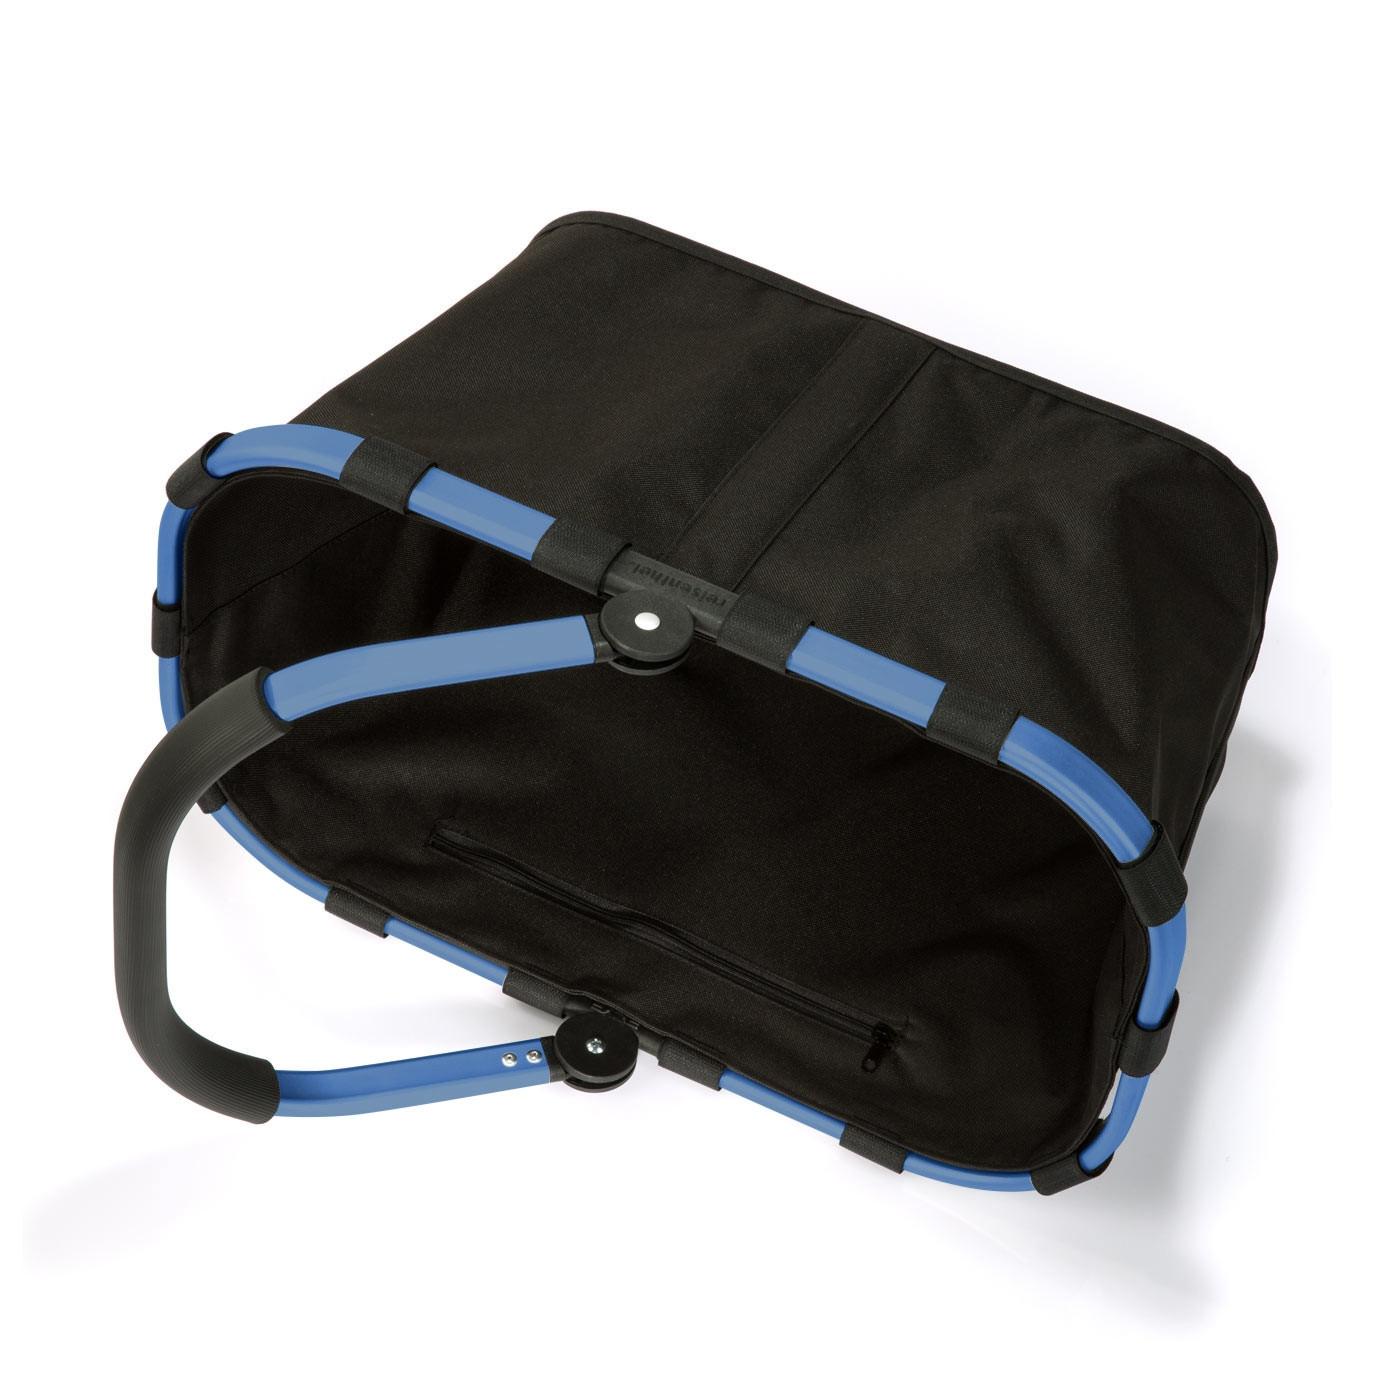 reisenthel® carrybag 22l BK7042 GRATIS blue frame/ black